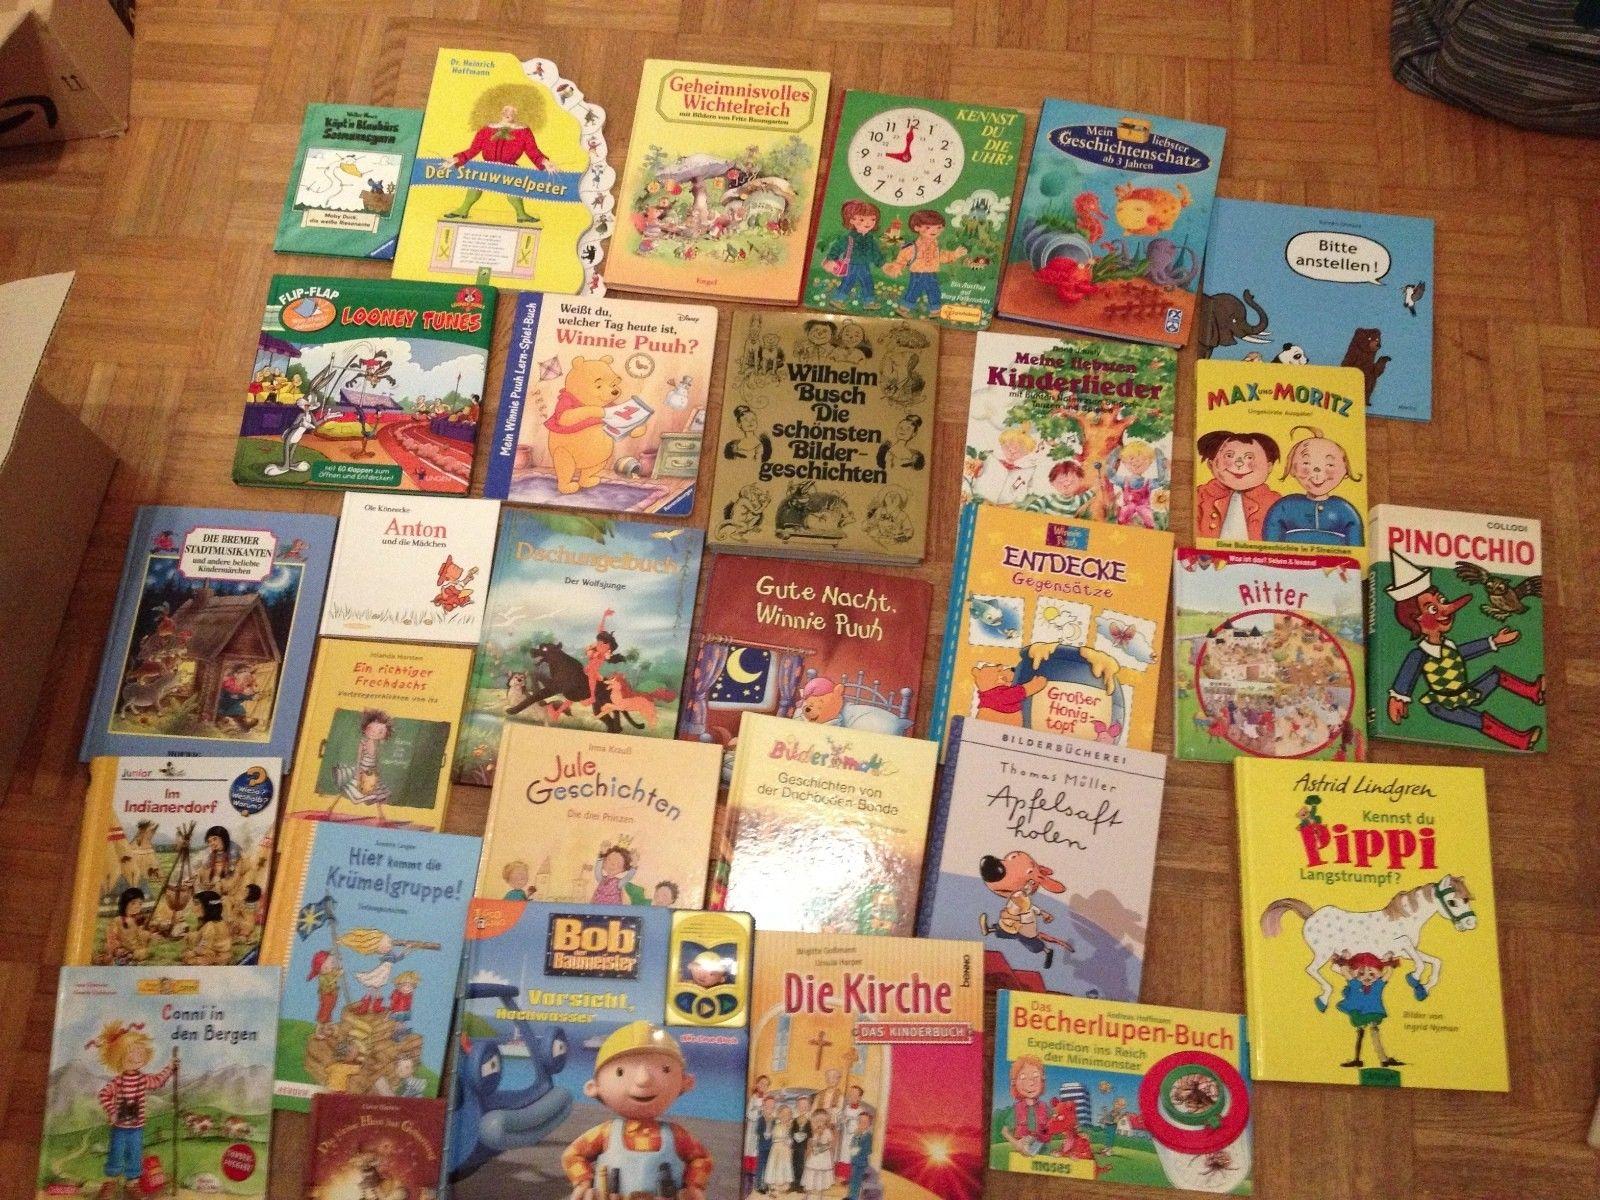 Paket Kinderbücher, 30 Stück, Konvolut, Büchersammlung